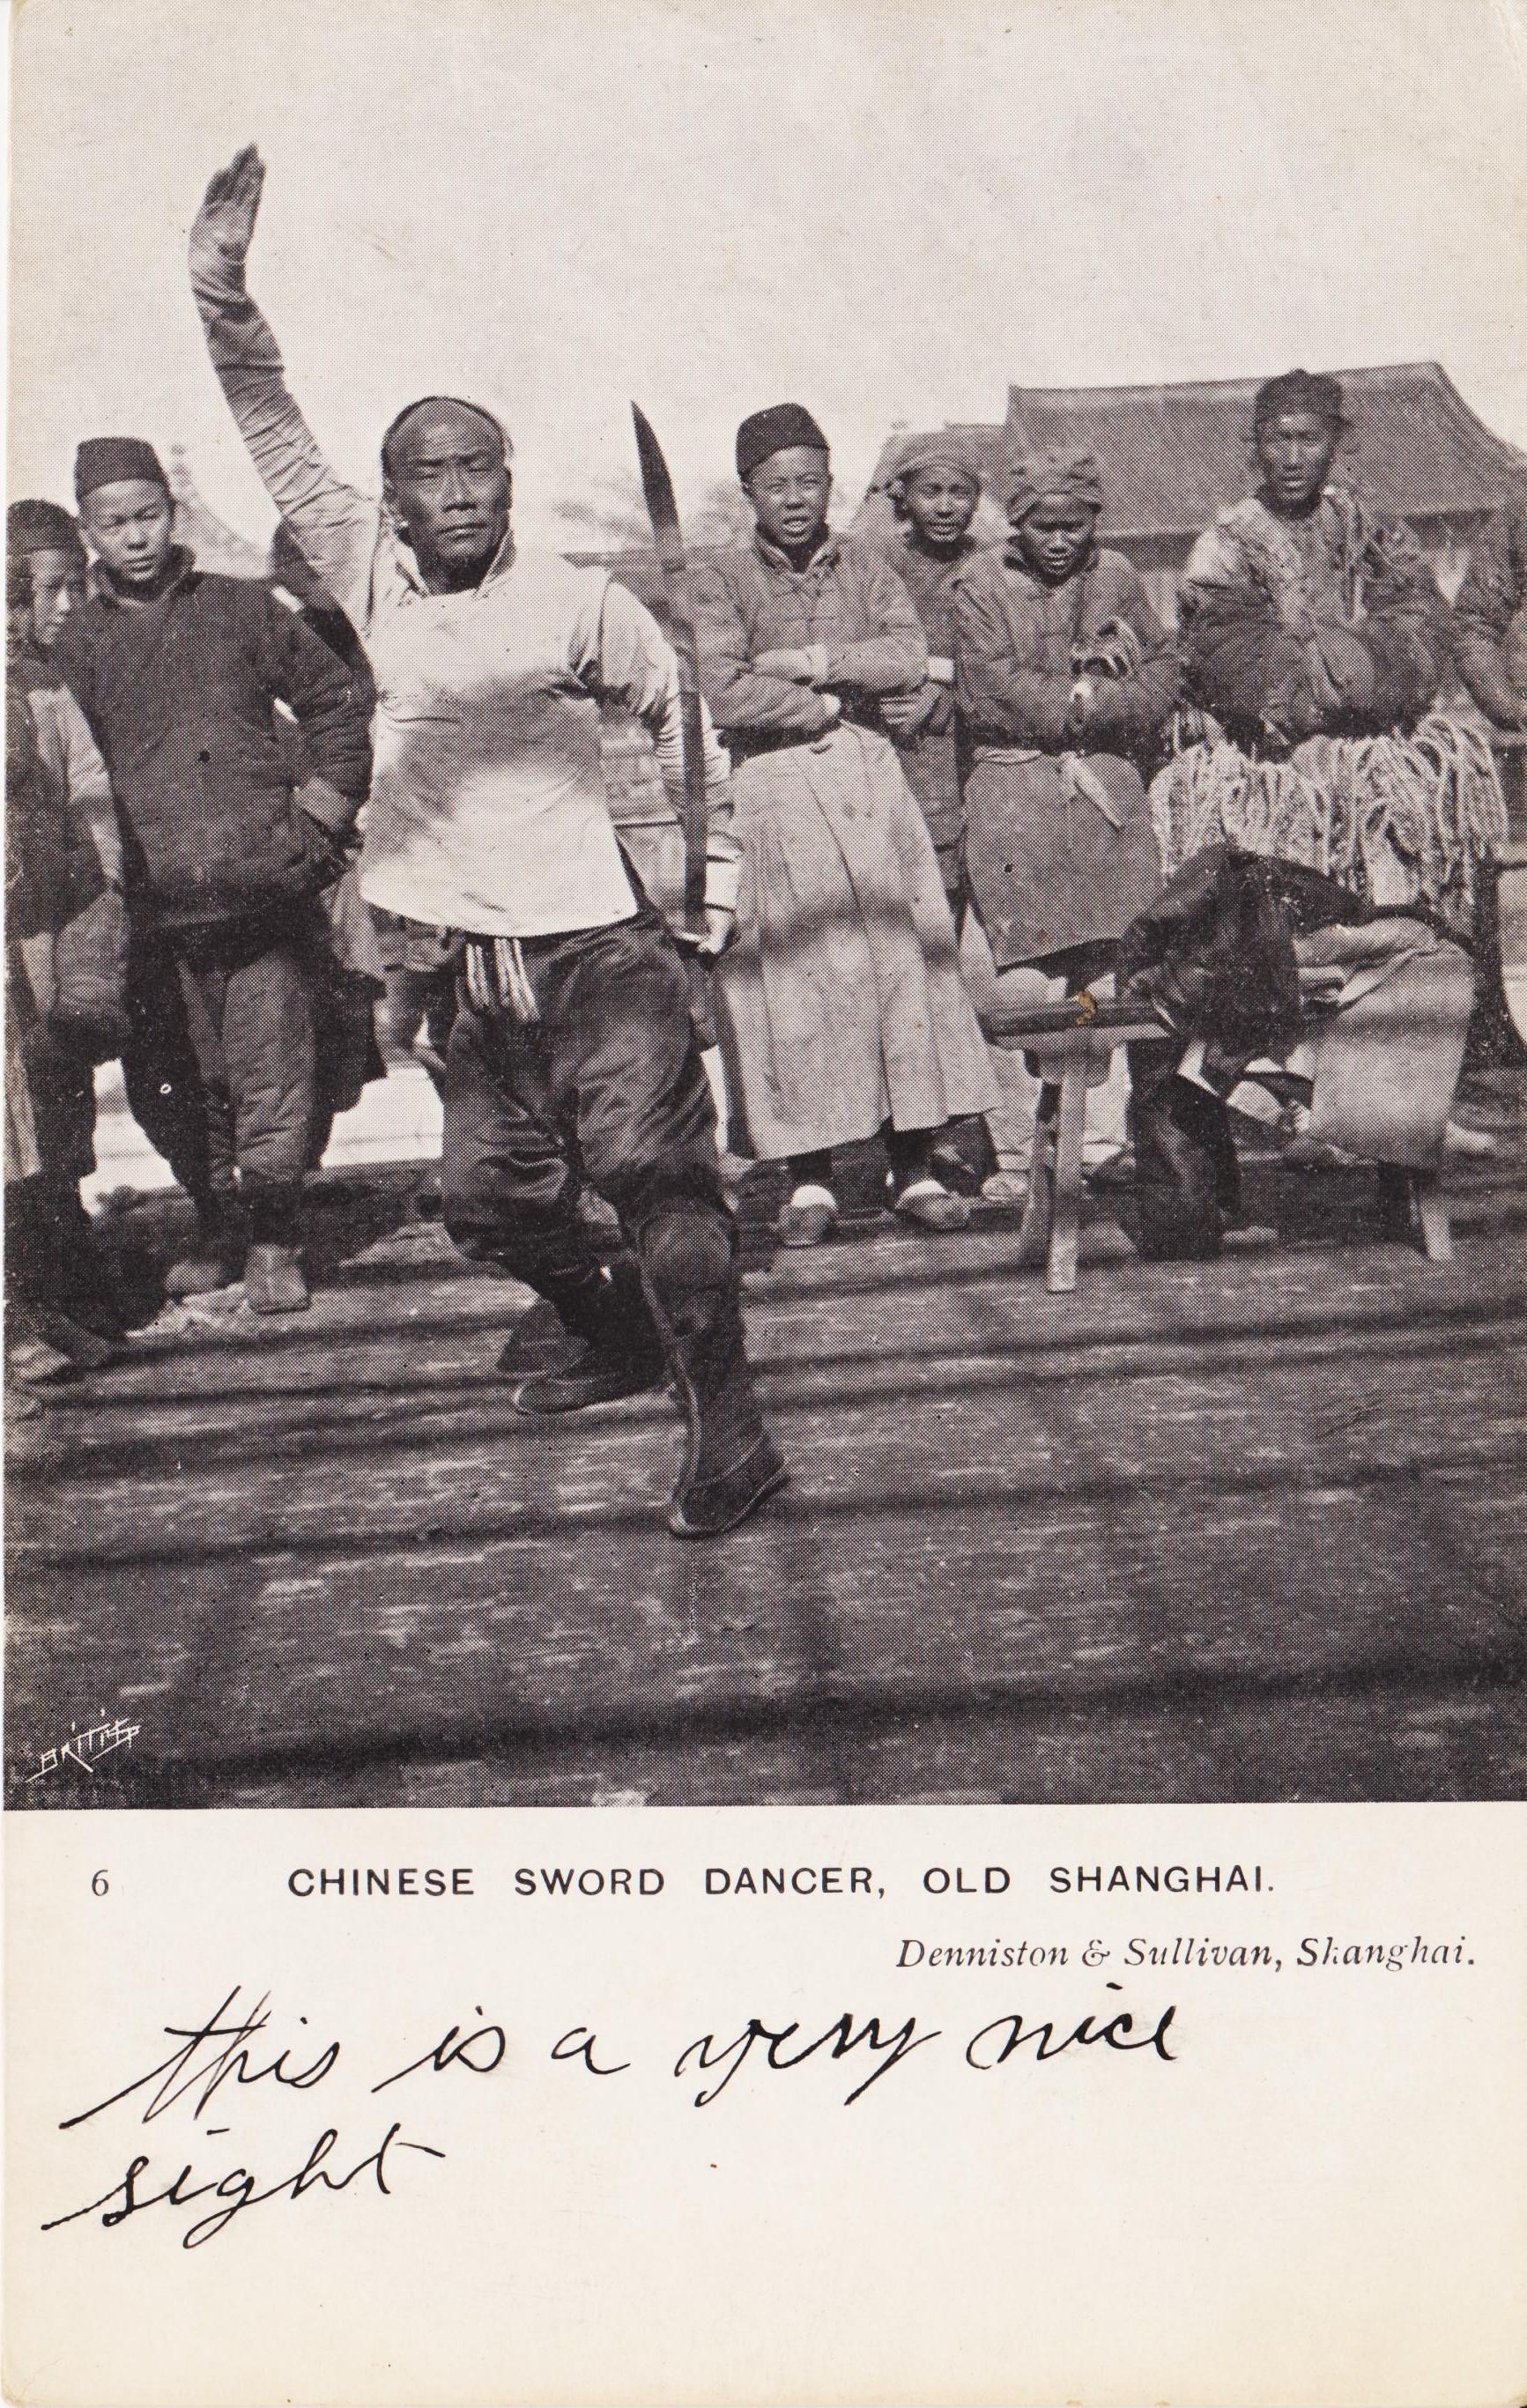 Intelligent Uniforme Kimono Kung Fu Uniforme Chang Quan Uniforme Shan Xi Drago Rouge Chinois Boxing, Martial Arts & Mma